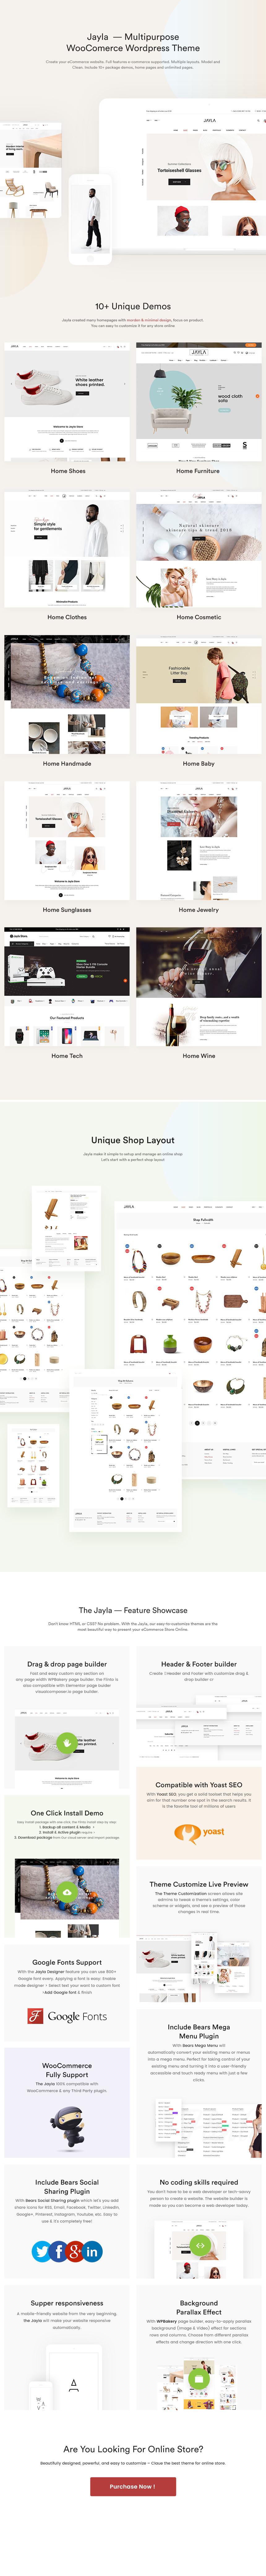 Jayla - Minimal & Modern Multi-Concept WooCommerce Theme - 1